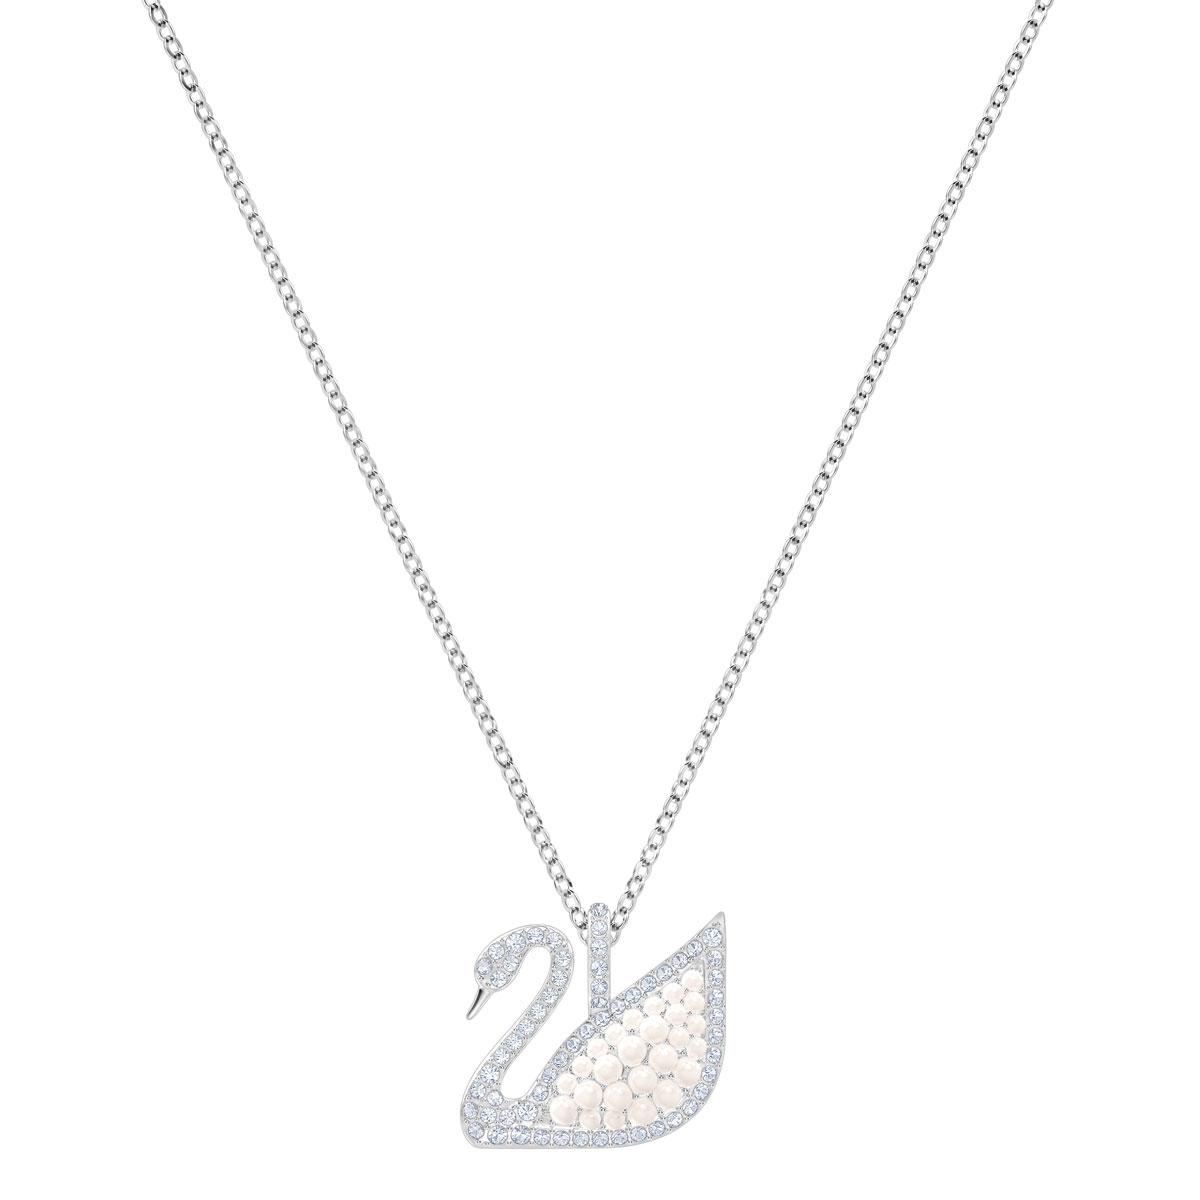 Swarovski Crystal and White Rhodium Iconic Swan Pendant Necklace